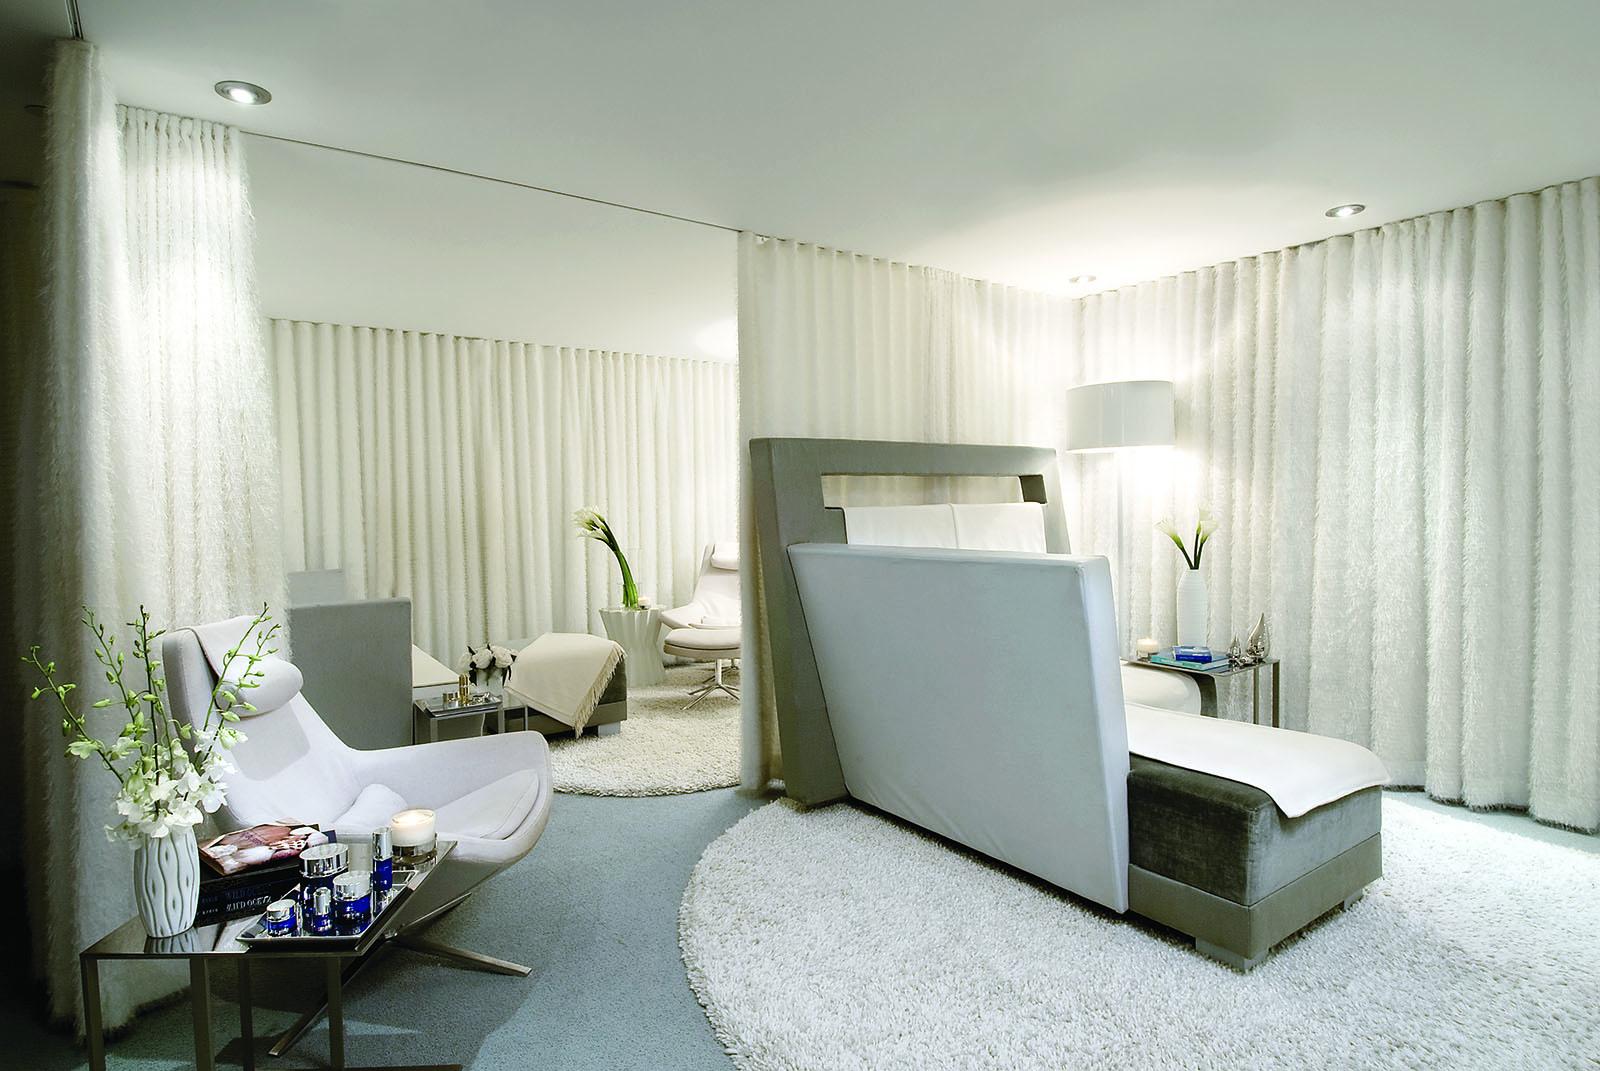 4_la-prairie-spa-relaxation-area